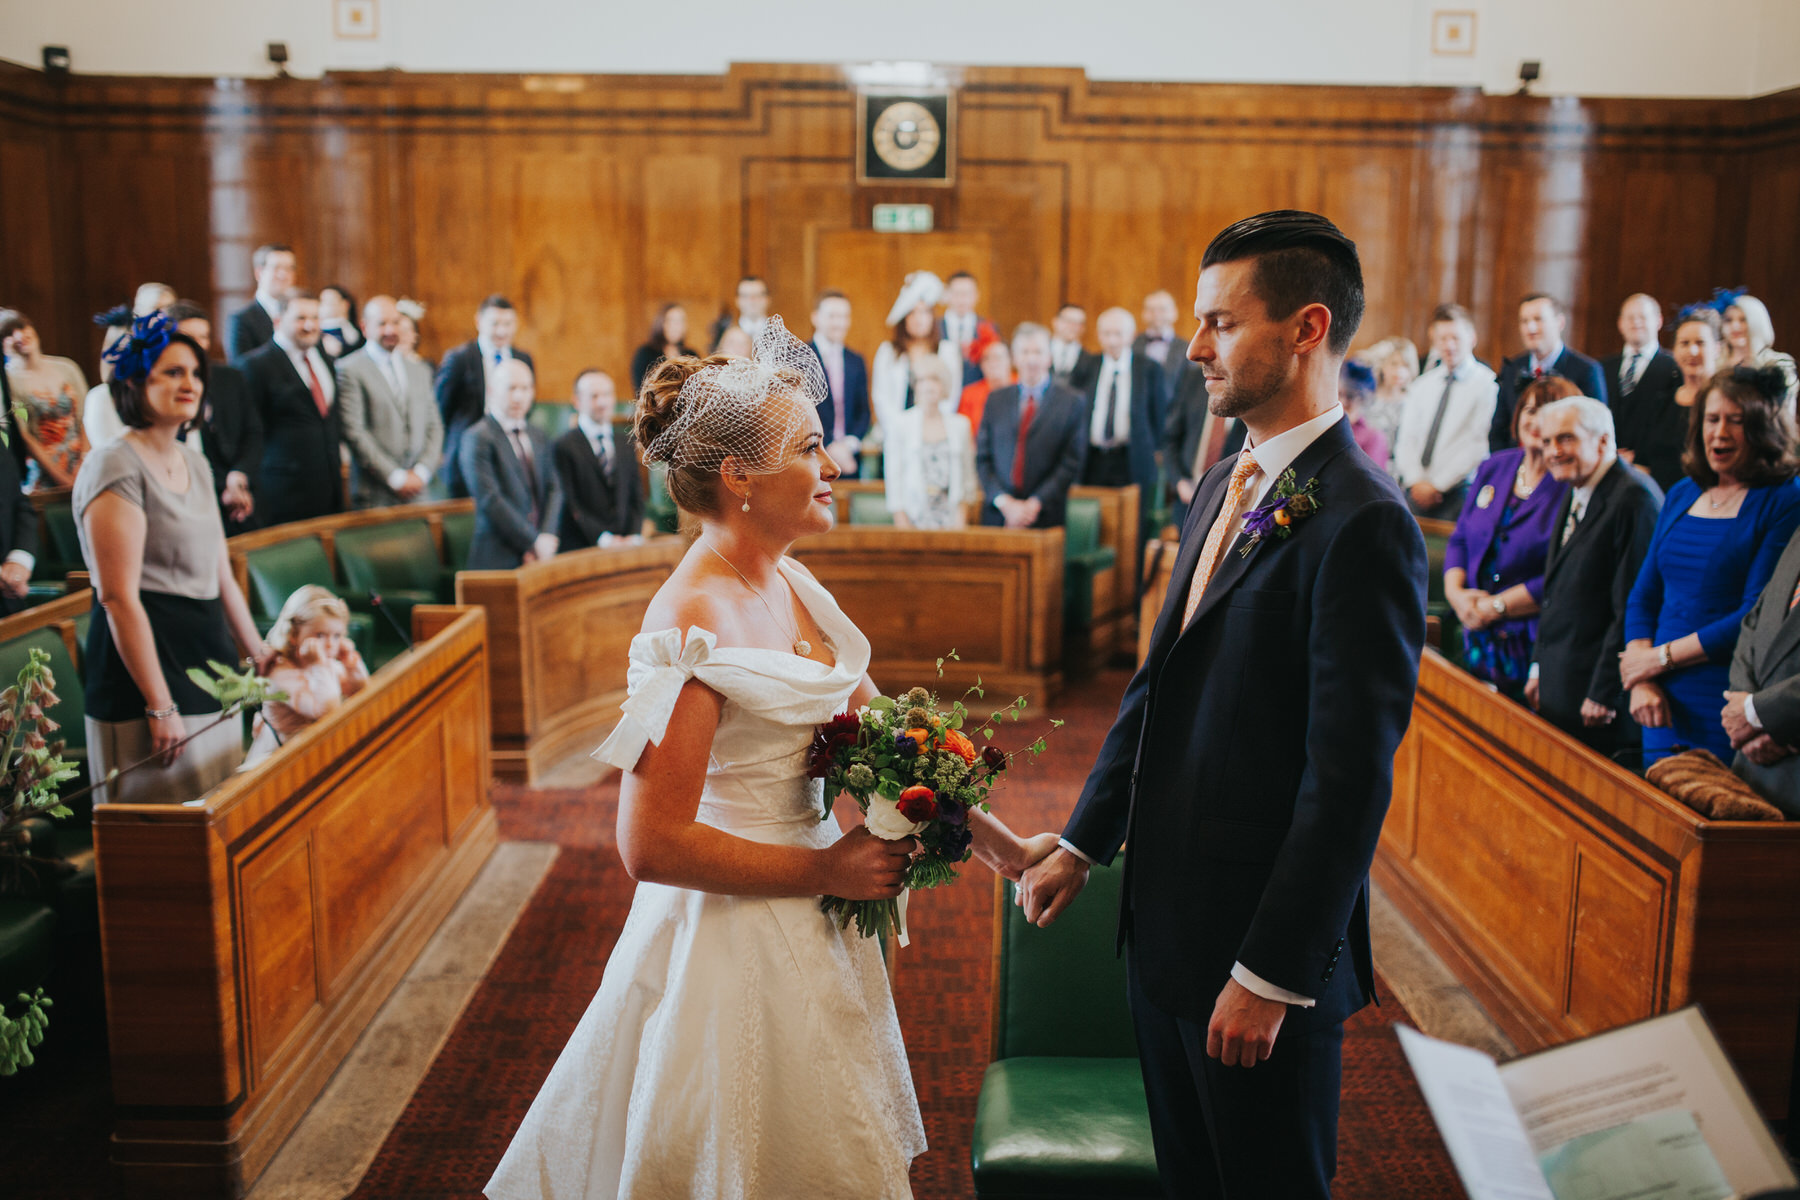 Civil-ceremony-wedding-Hackney-alternative-photographer.jpg